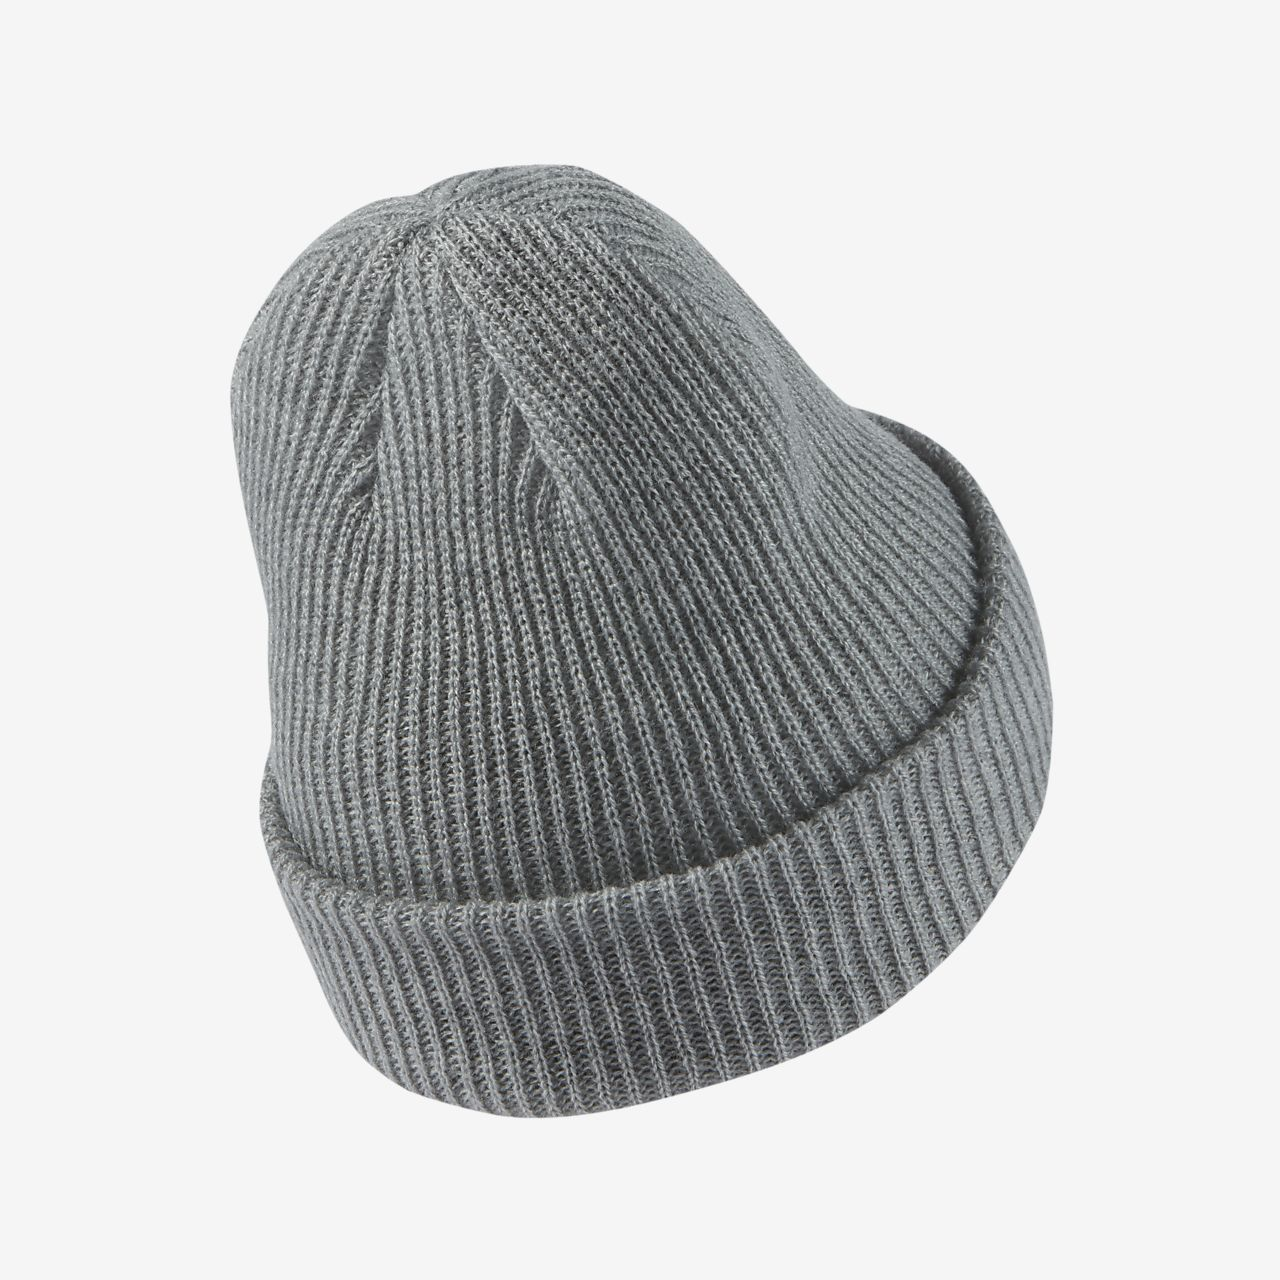 74afc85bac7 Nike SB Fisherman Knit Hat. Nike.com AU